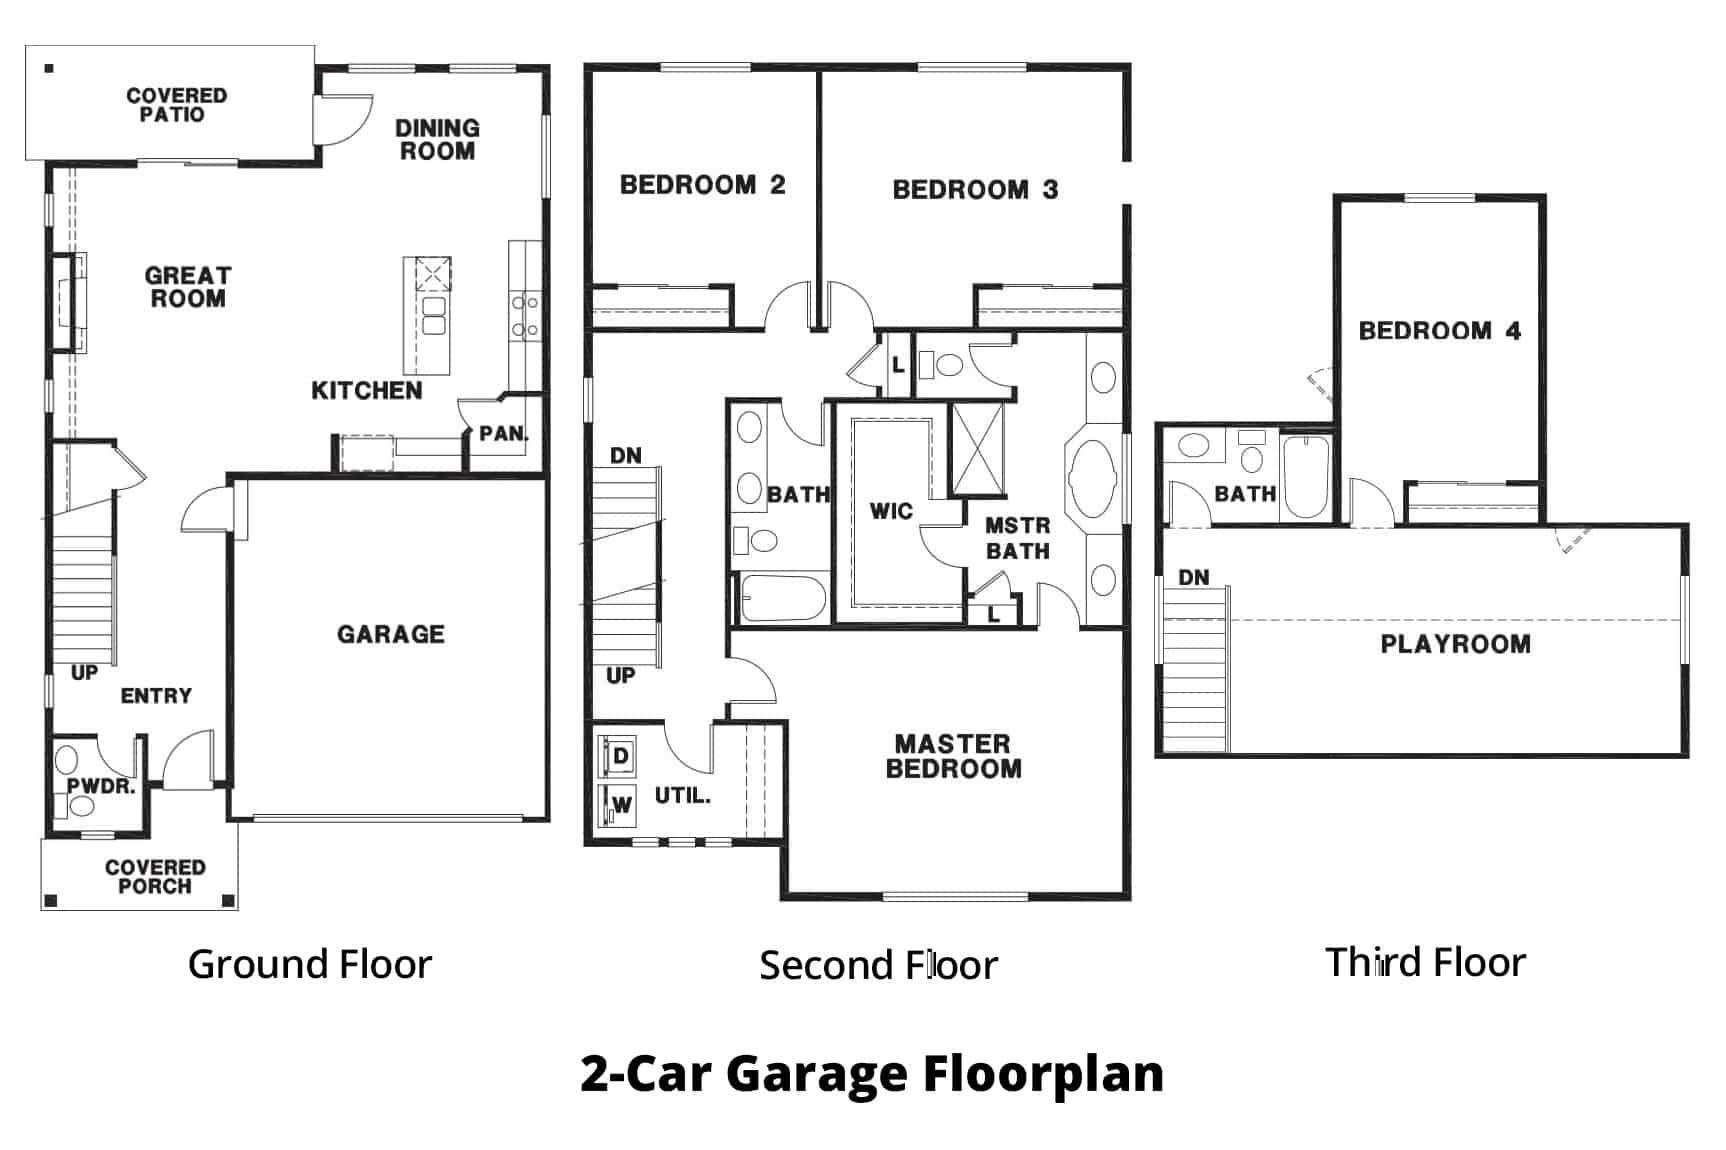 soundbuilt-hemlock-floorplan-2817-2car-lables